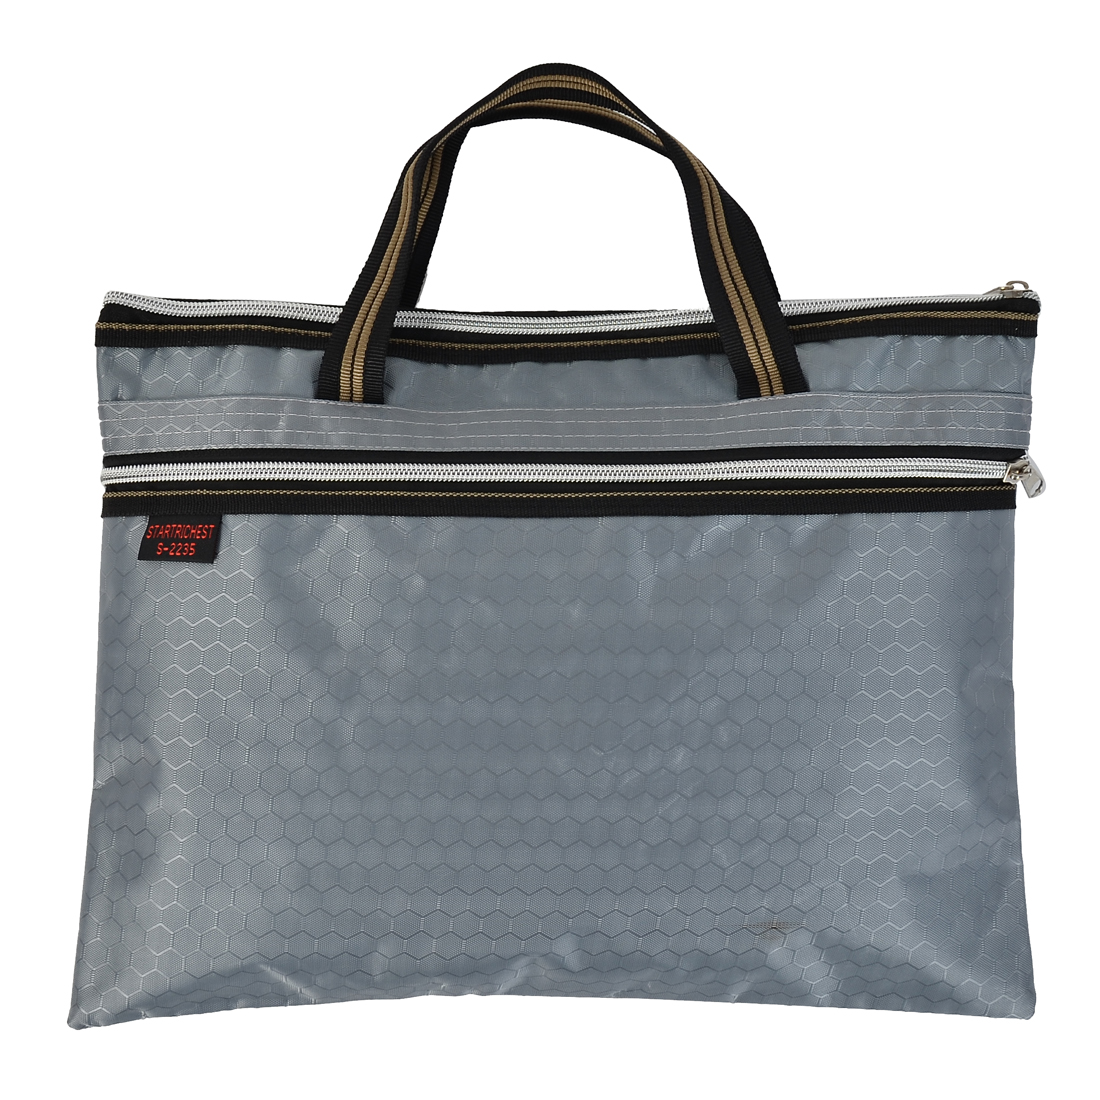 Document File Nylon Hexagon Pattern A4 Zip Up Hand Bag Tote Organizer Gray